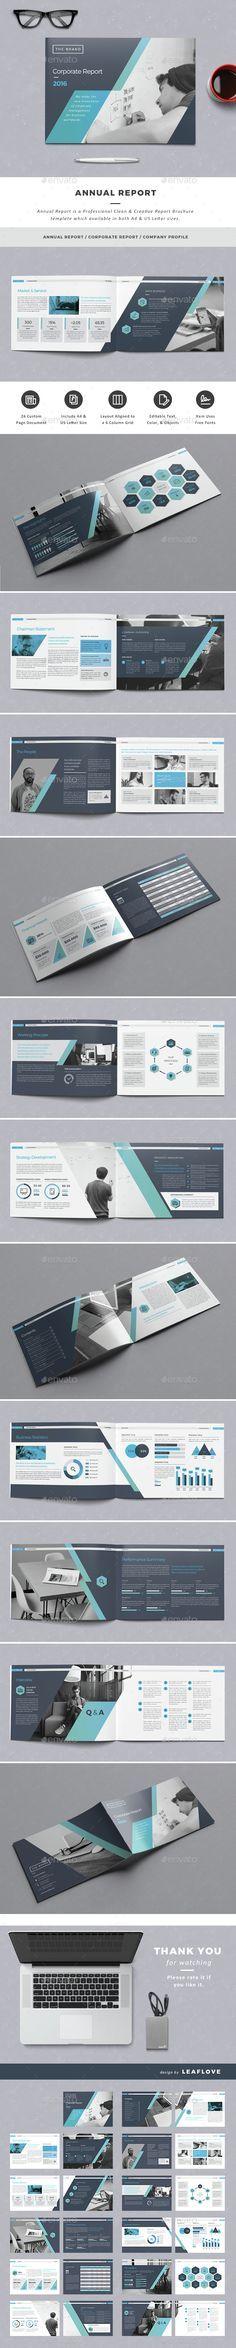 Annual Report Landscape / Clean & Creative Report Brochure Template